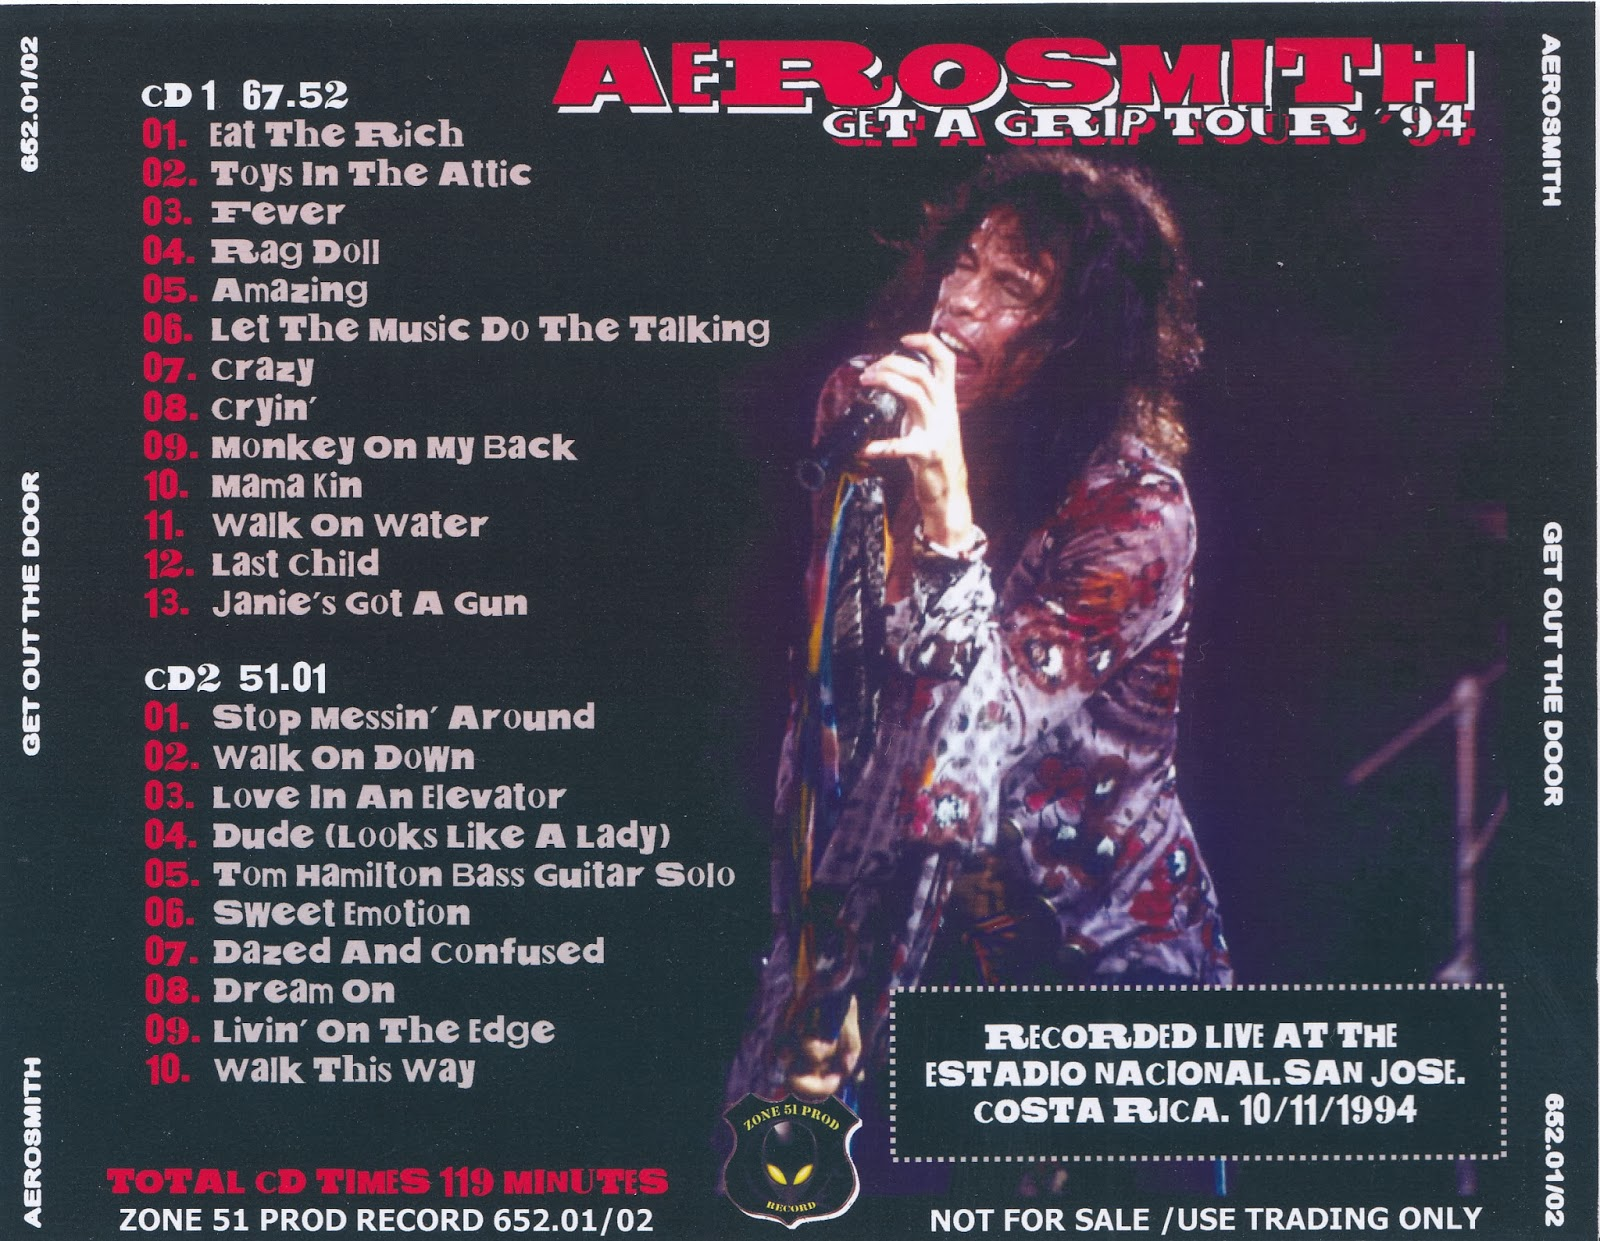 Aerosmith Bootlegs Cover Arts 1 1 14 2 1 14